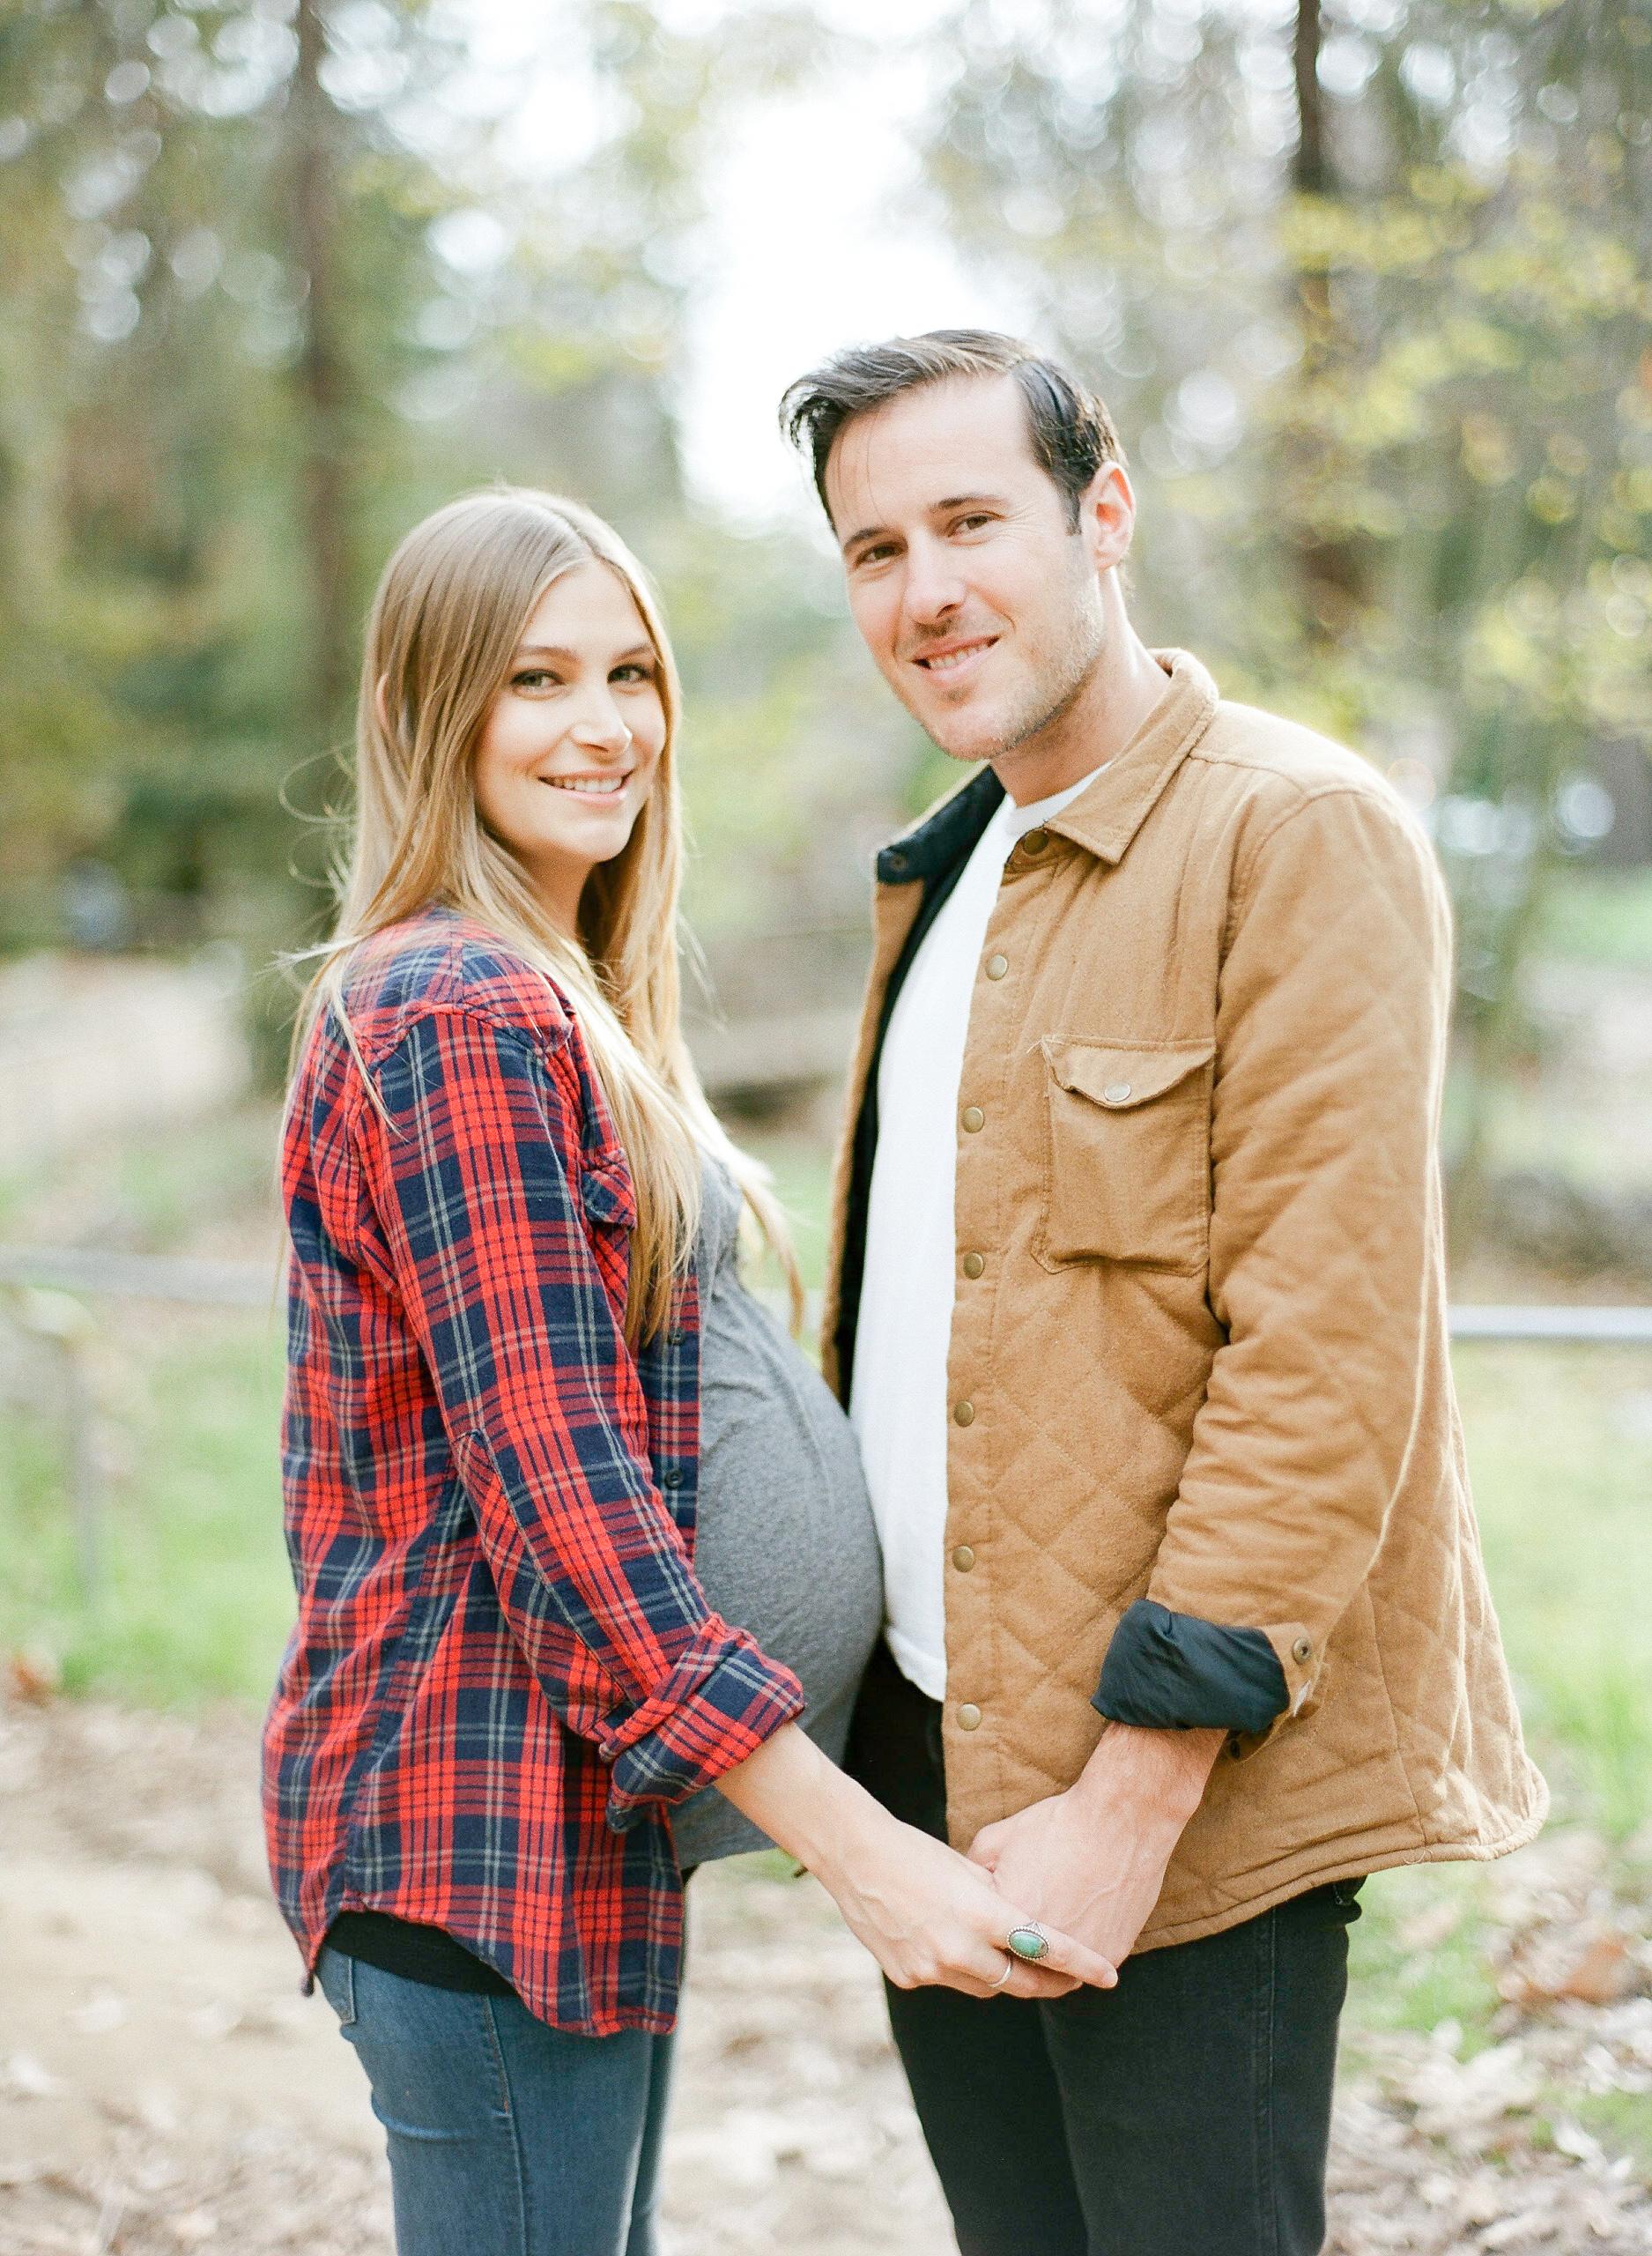 Chrissy & David Maternity Session-3.jpg